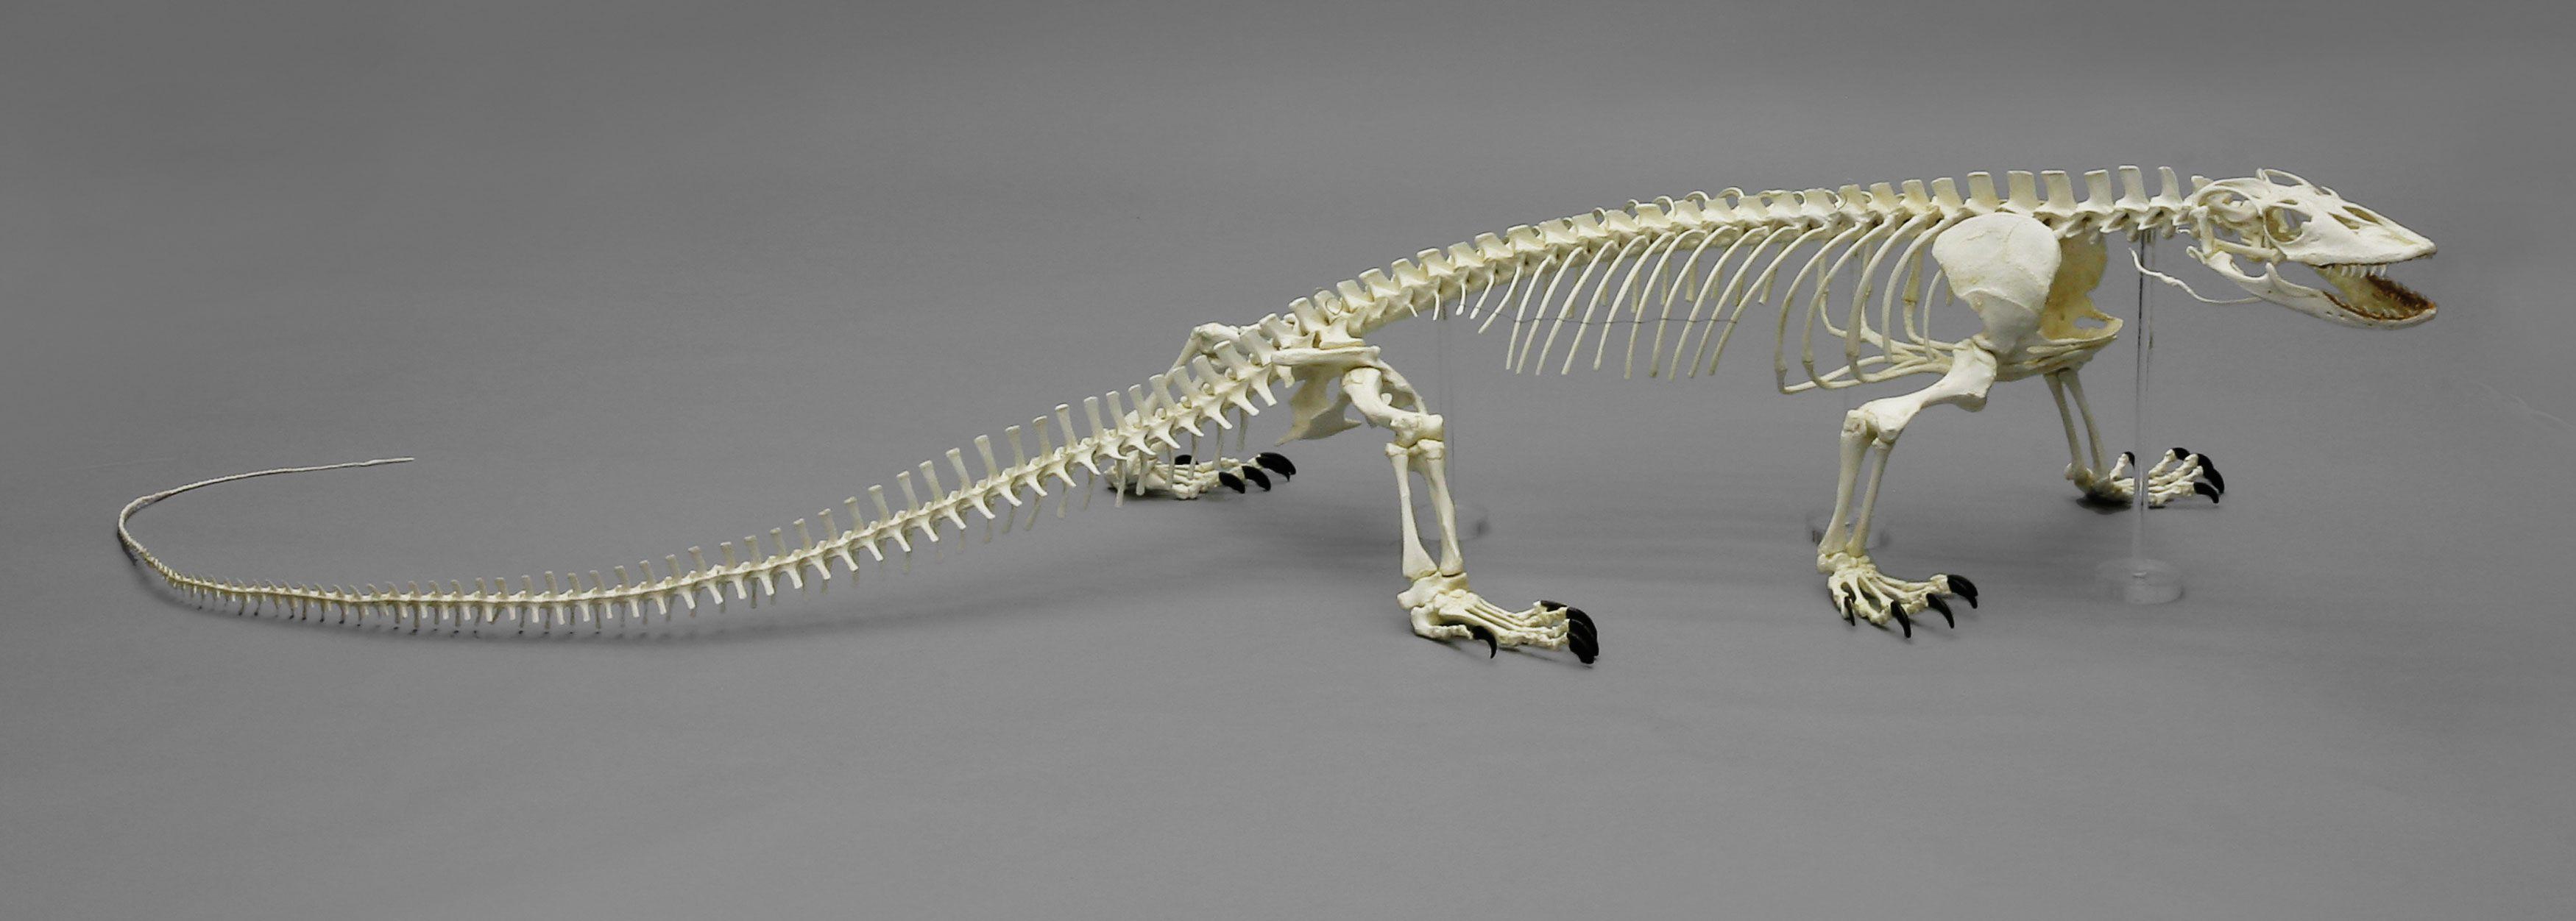 komodo dragon skeleton - Google Search | Animal Anatomy | Pinterest ...